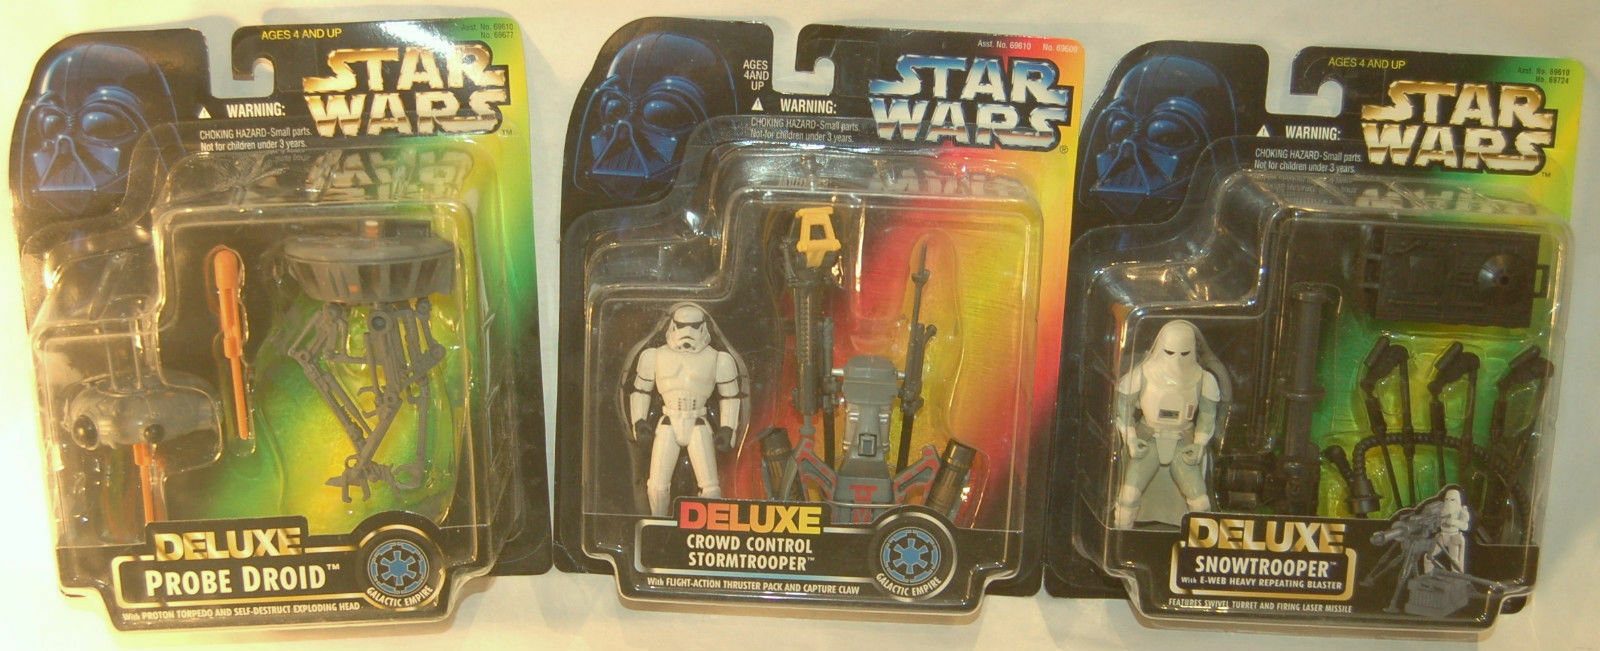 Star Wars Power of Force 1996 Deluxe Probe Droid Stormtrooper Snowtrooper Set